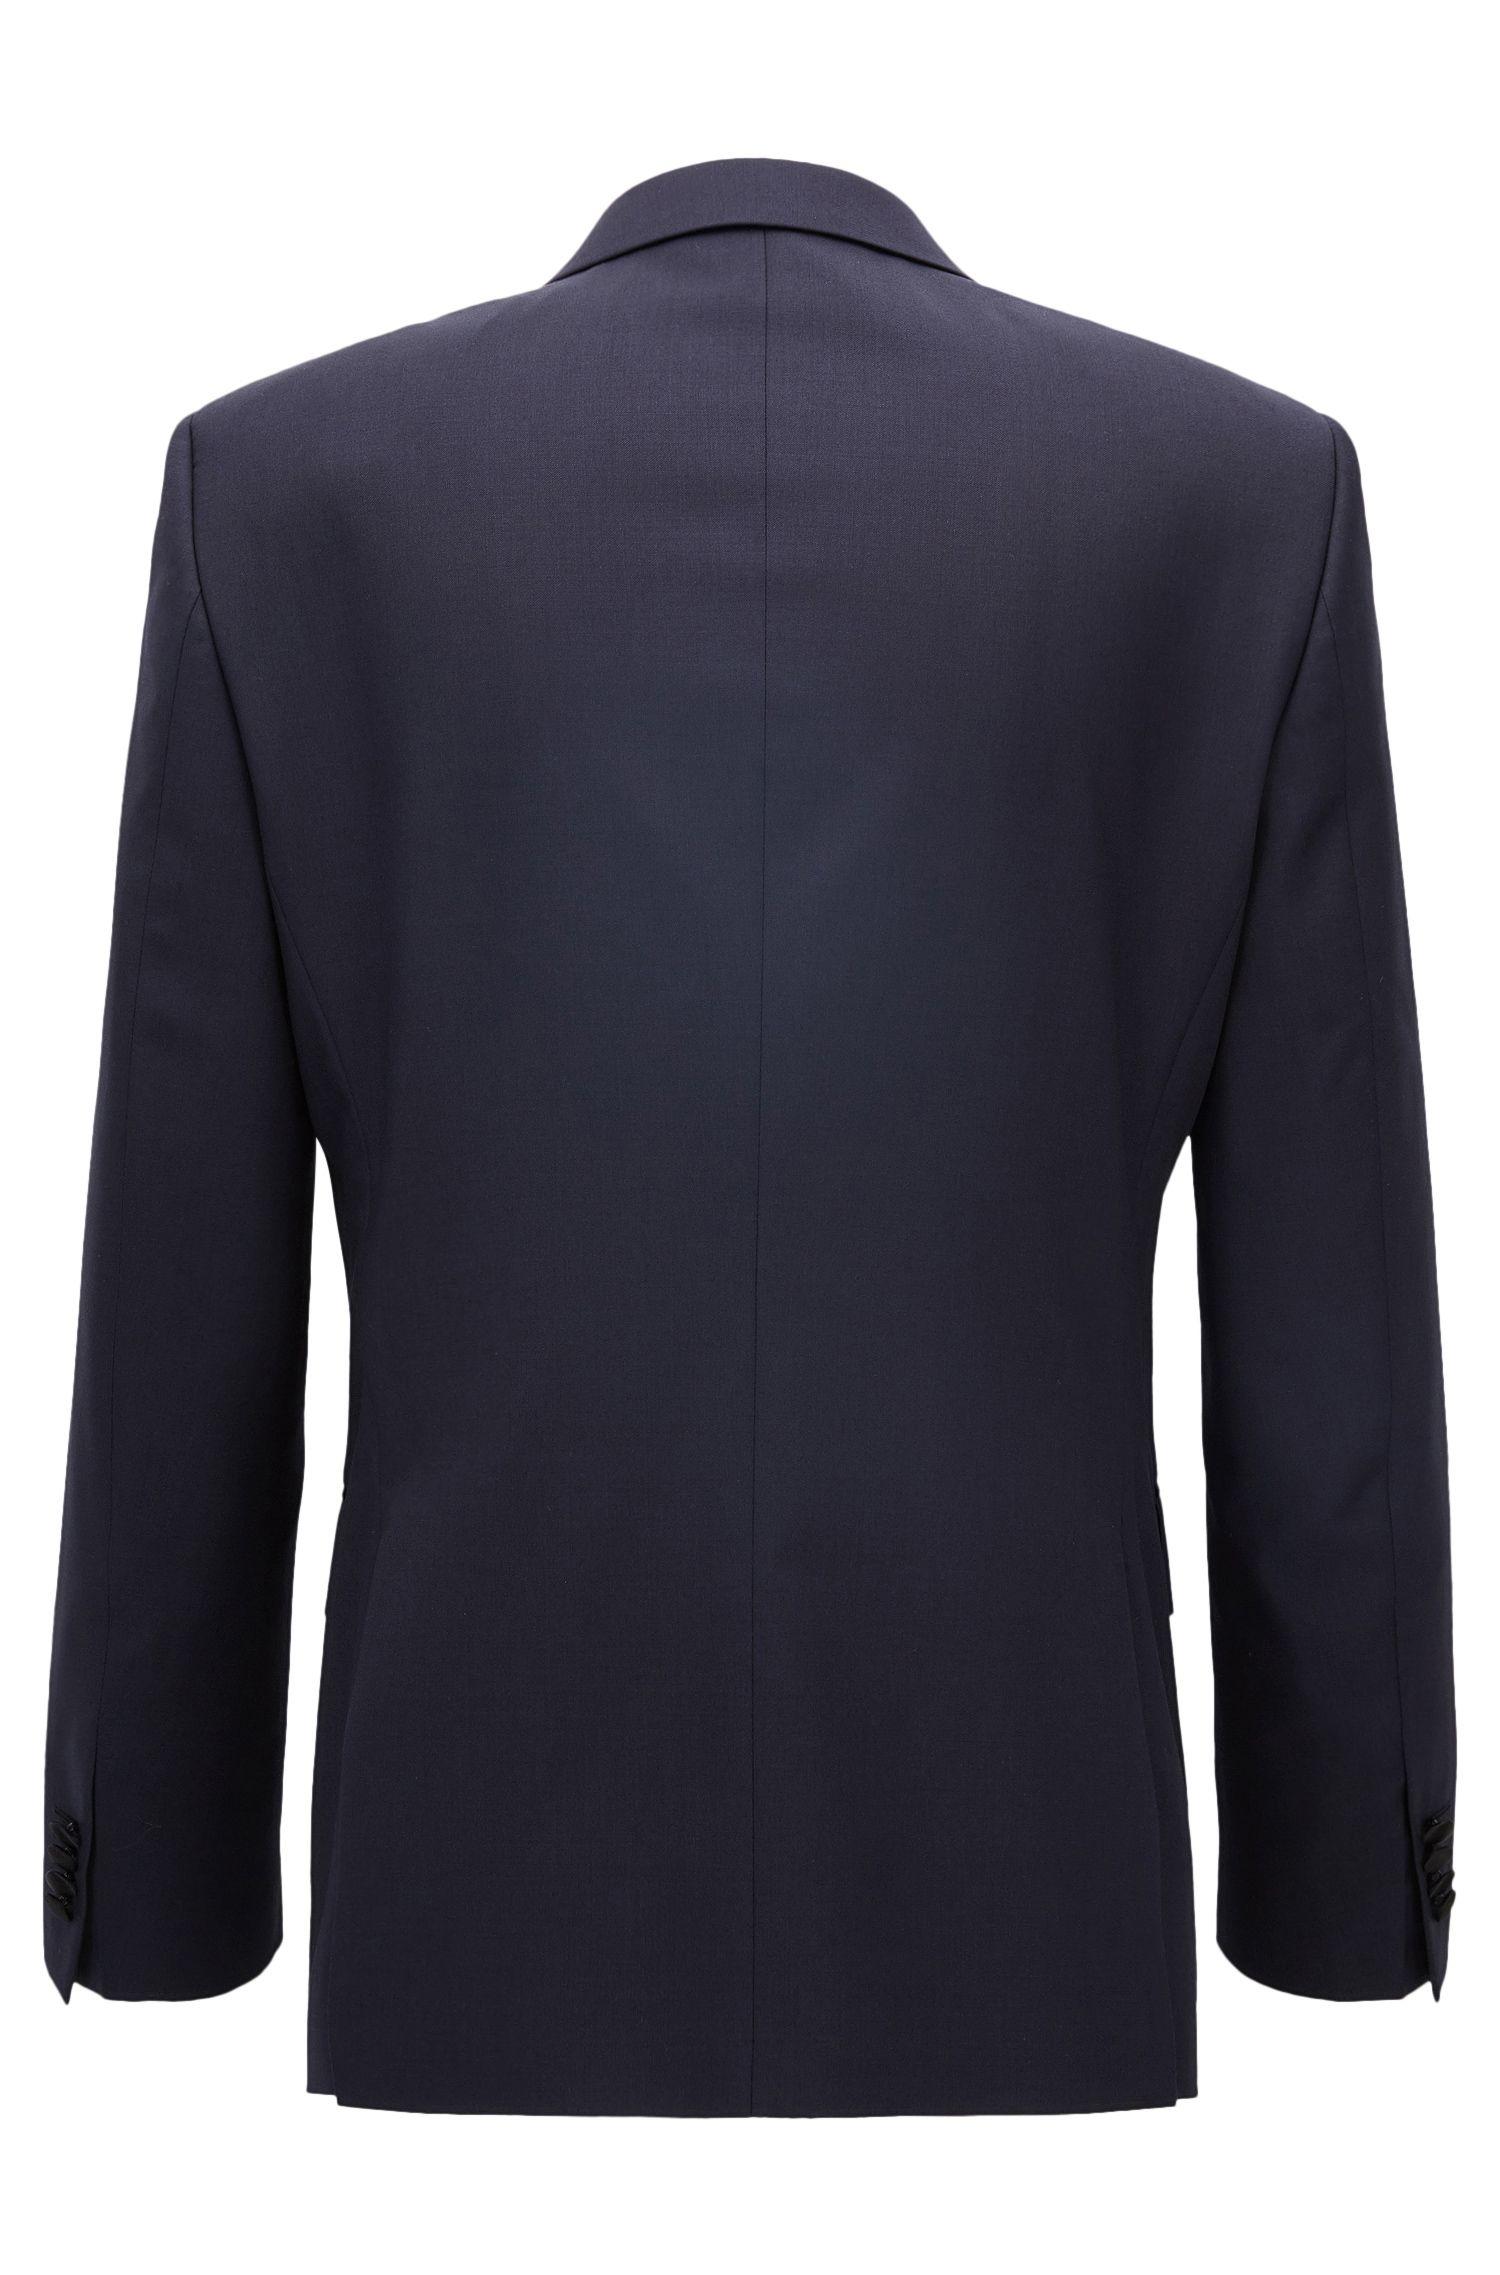 Italian Virgin Wool Suit Jacket, Slim Fit | Hence CYL, Dark Blue